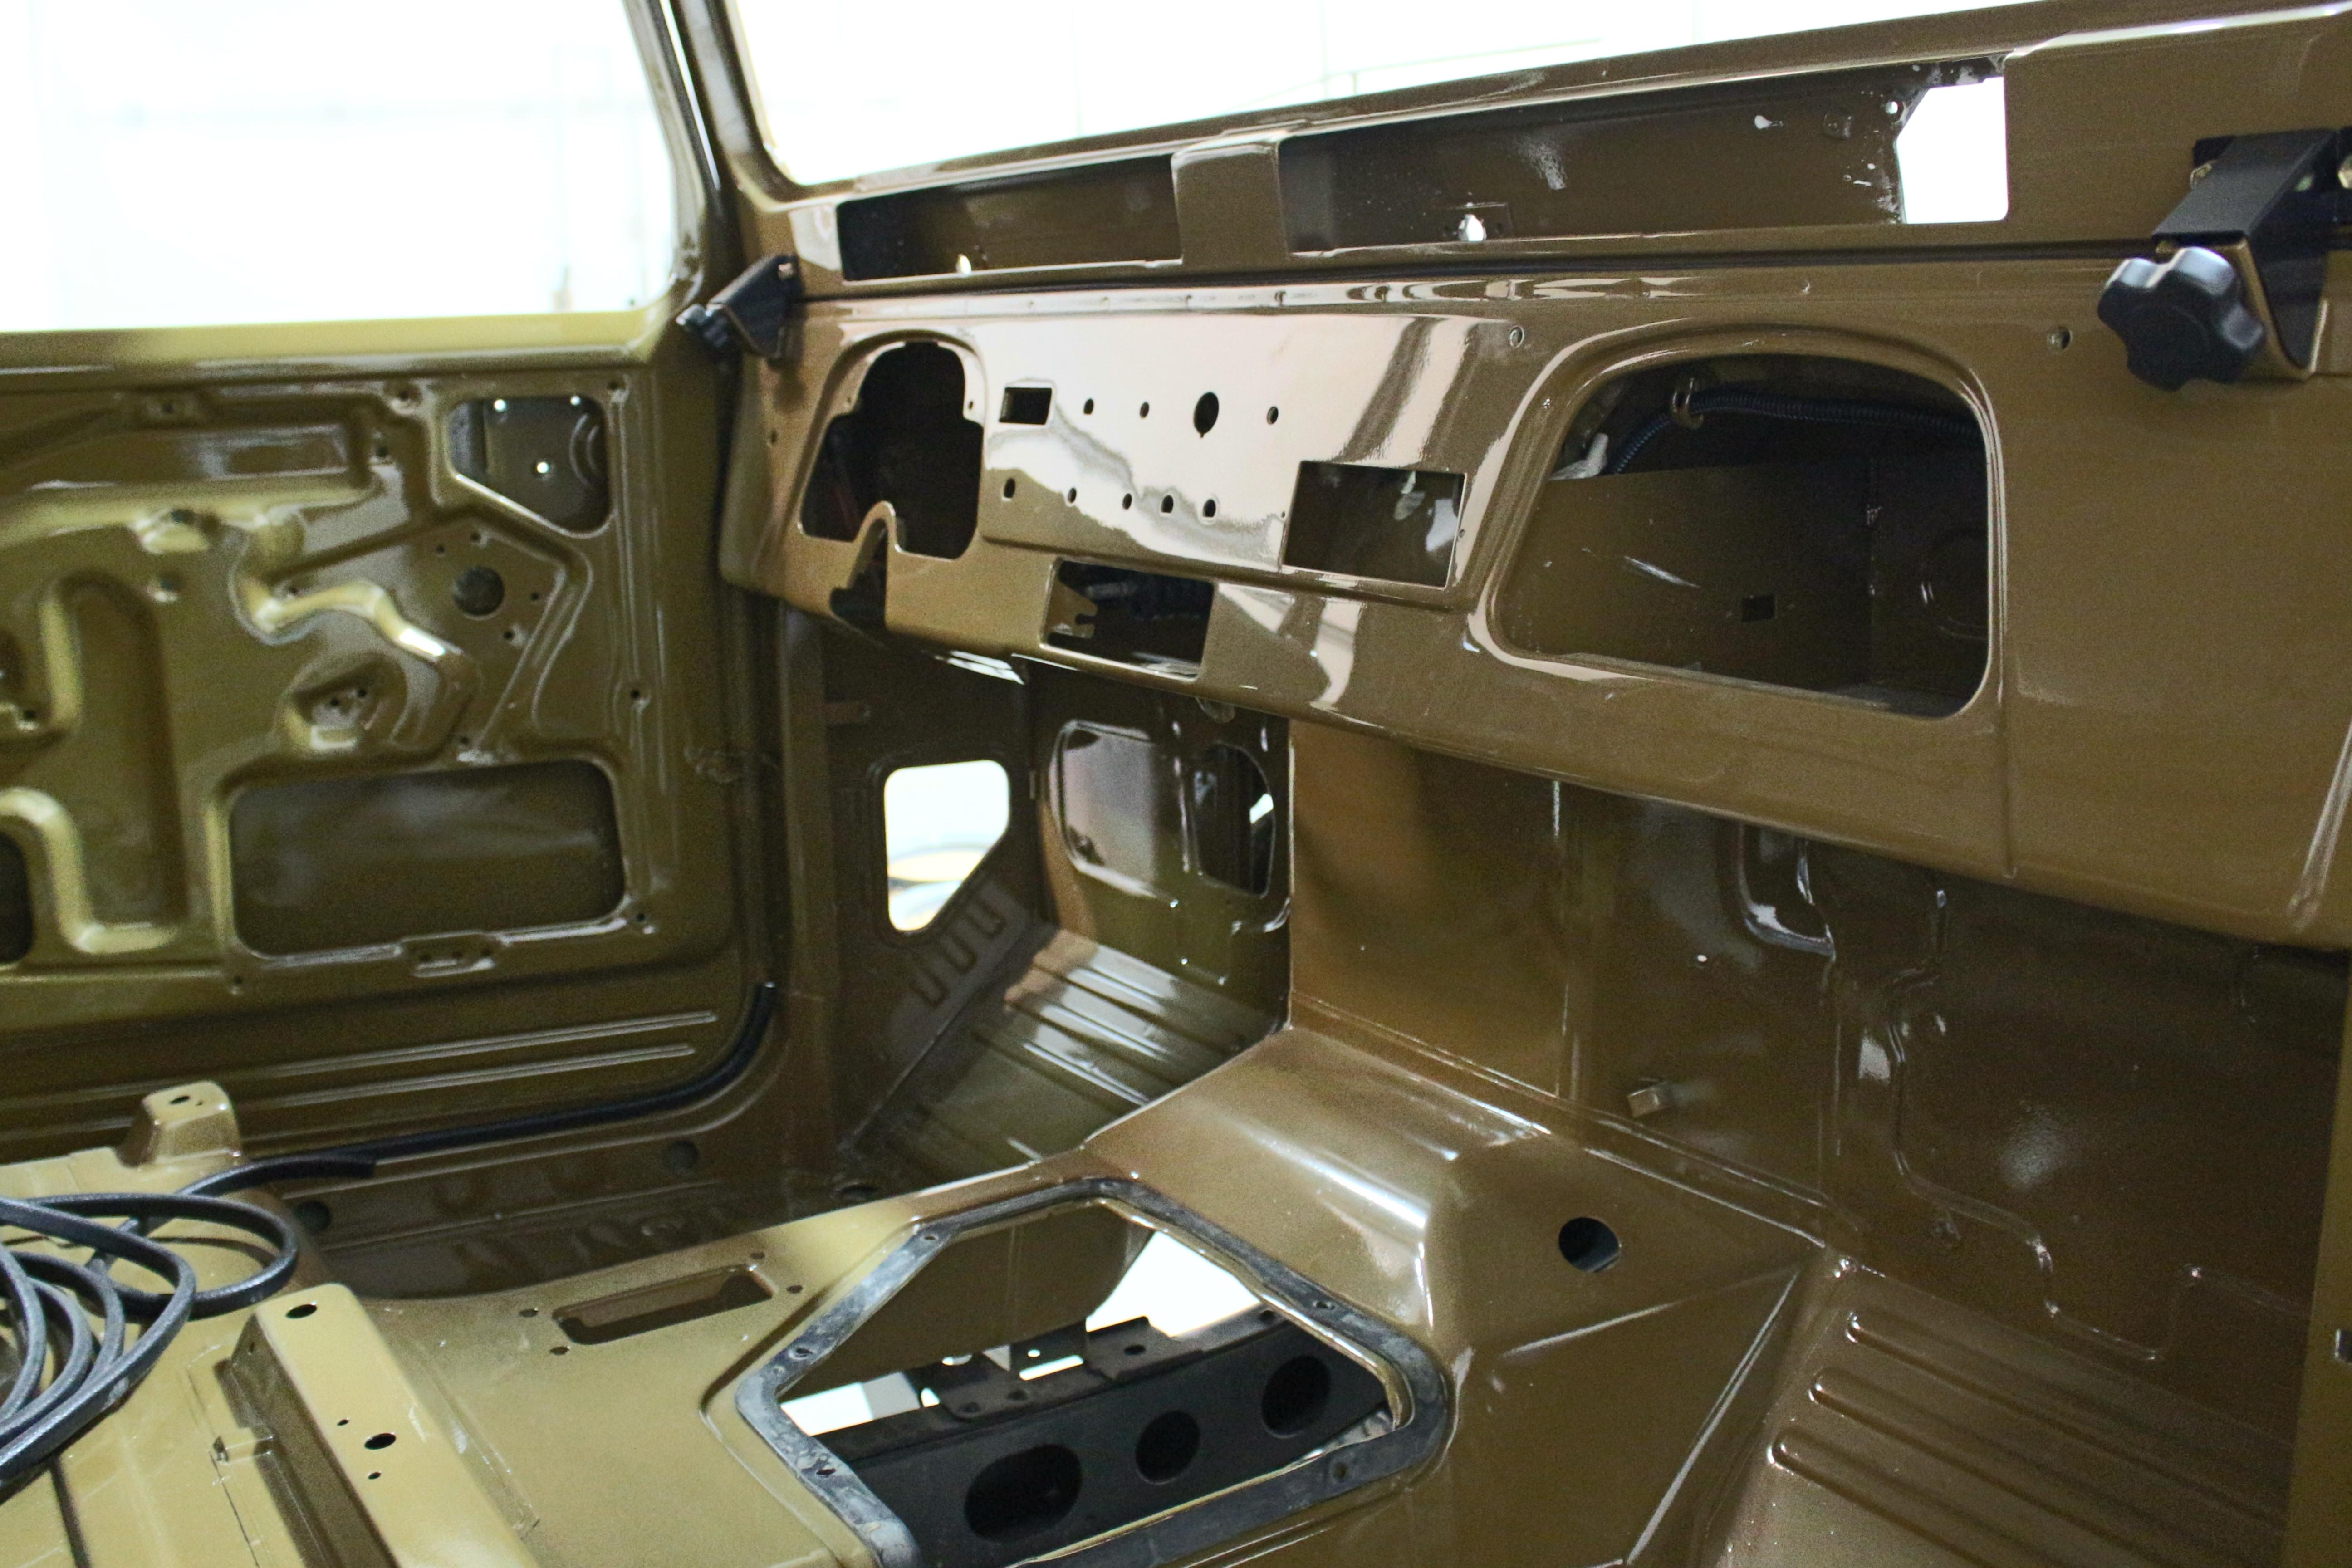 Olive 1980 FJ45 Pickup Truck